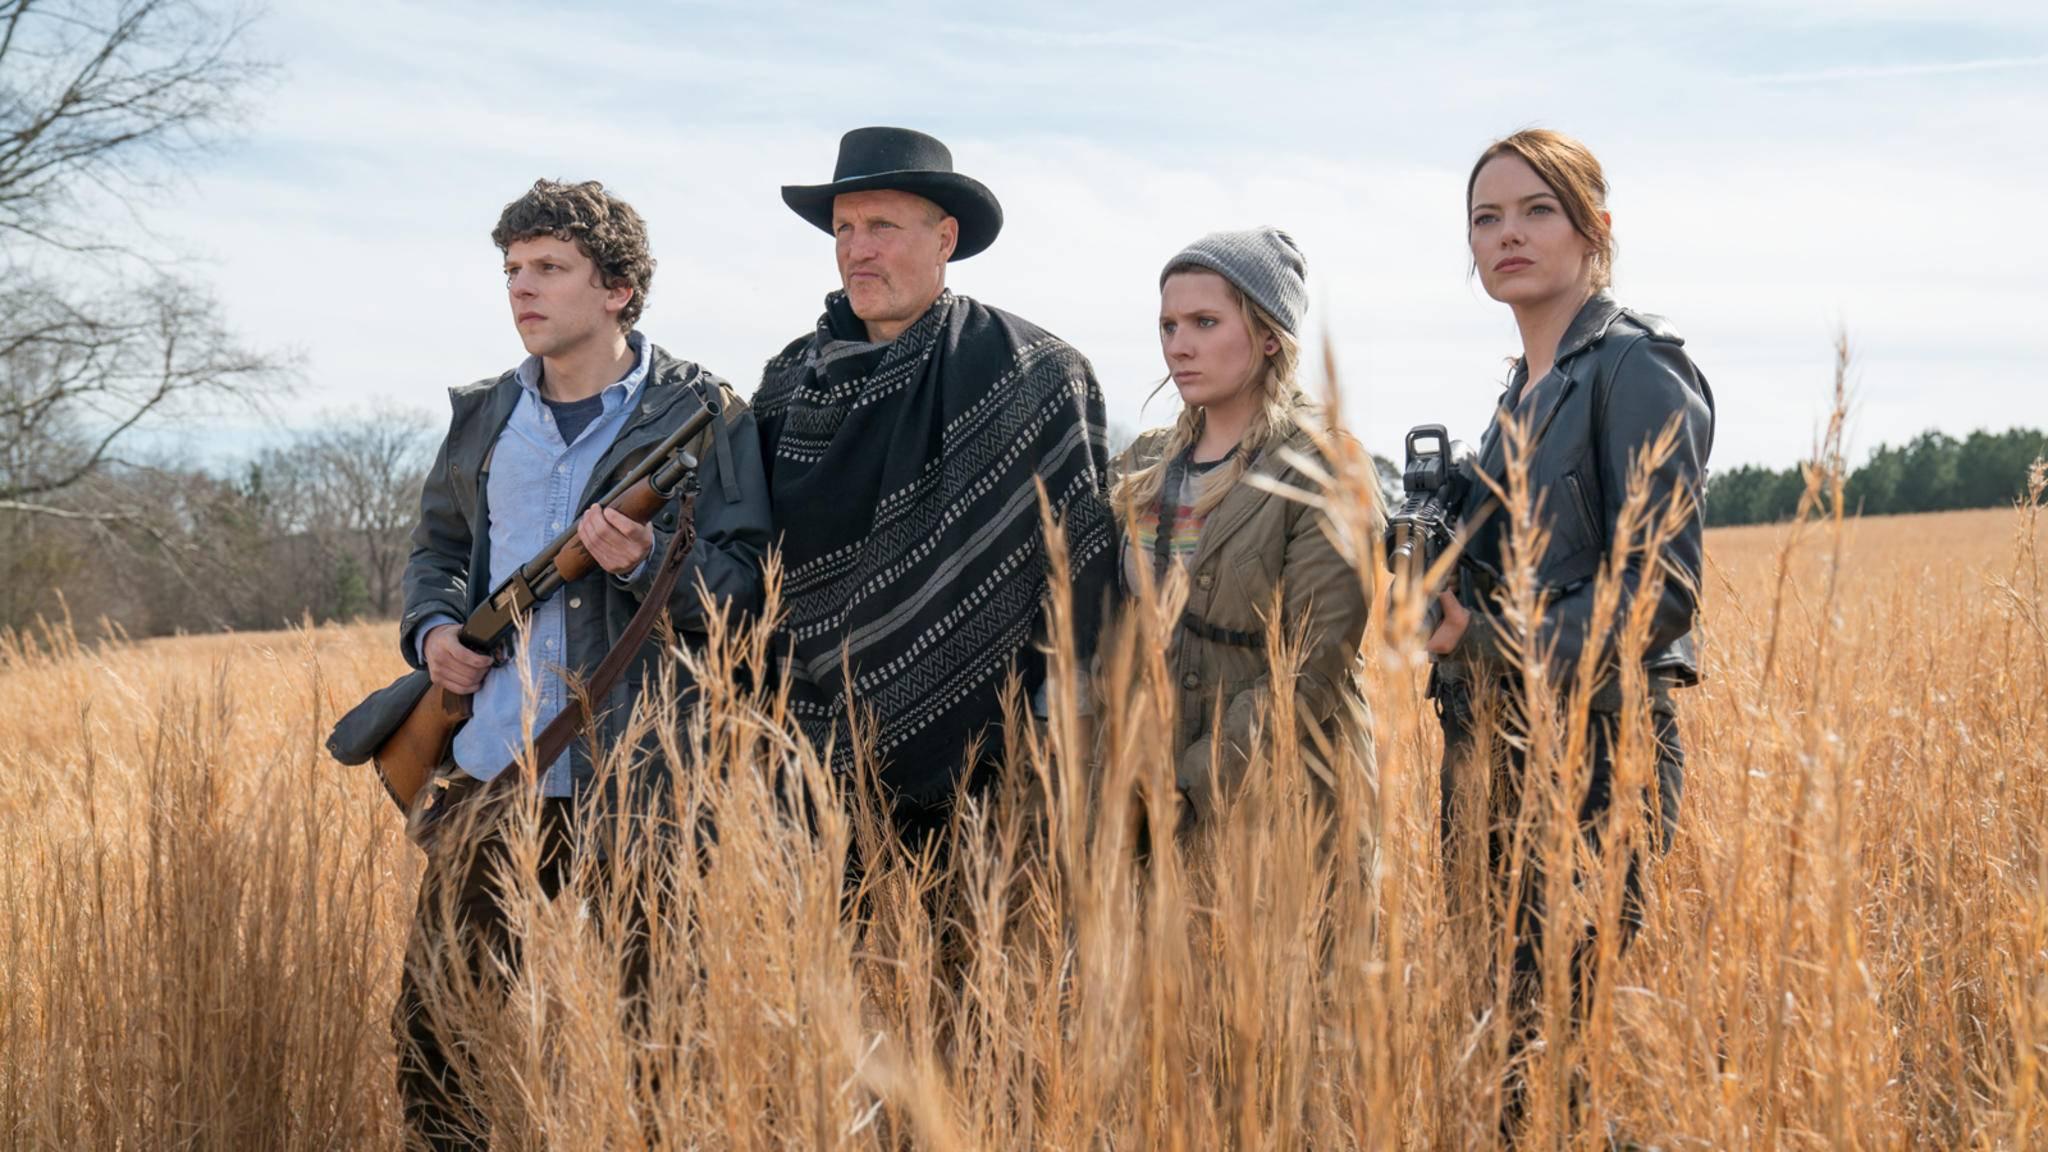 Jesse Eisenberg, Woody Harrelson, Abigail Breslin und Emma Stone in Zombieland 2